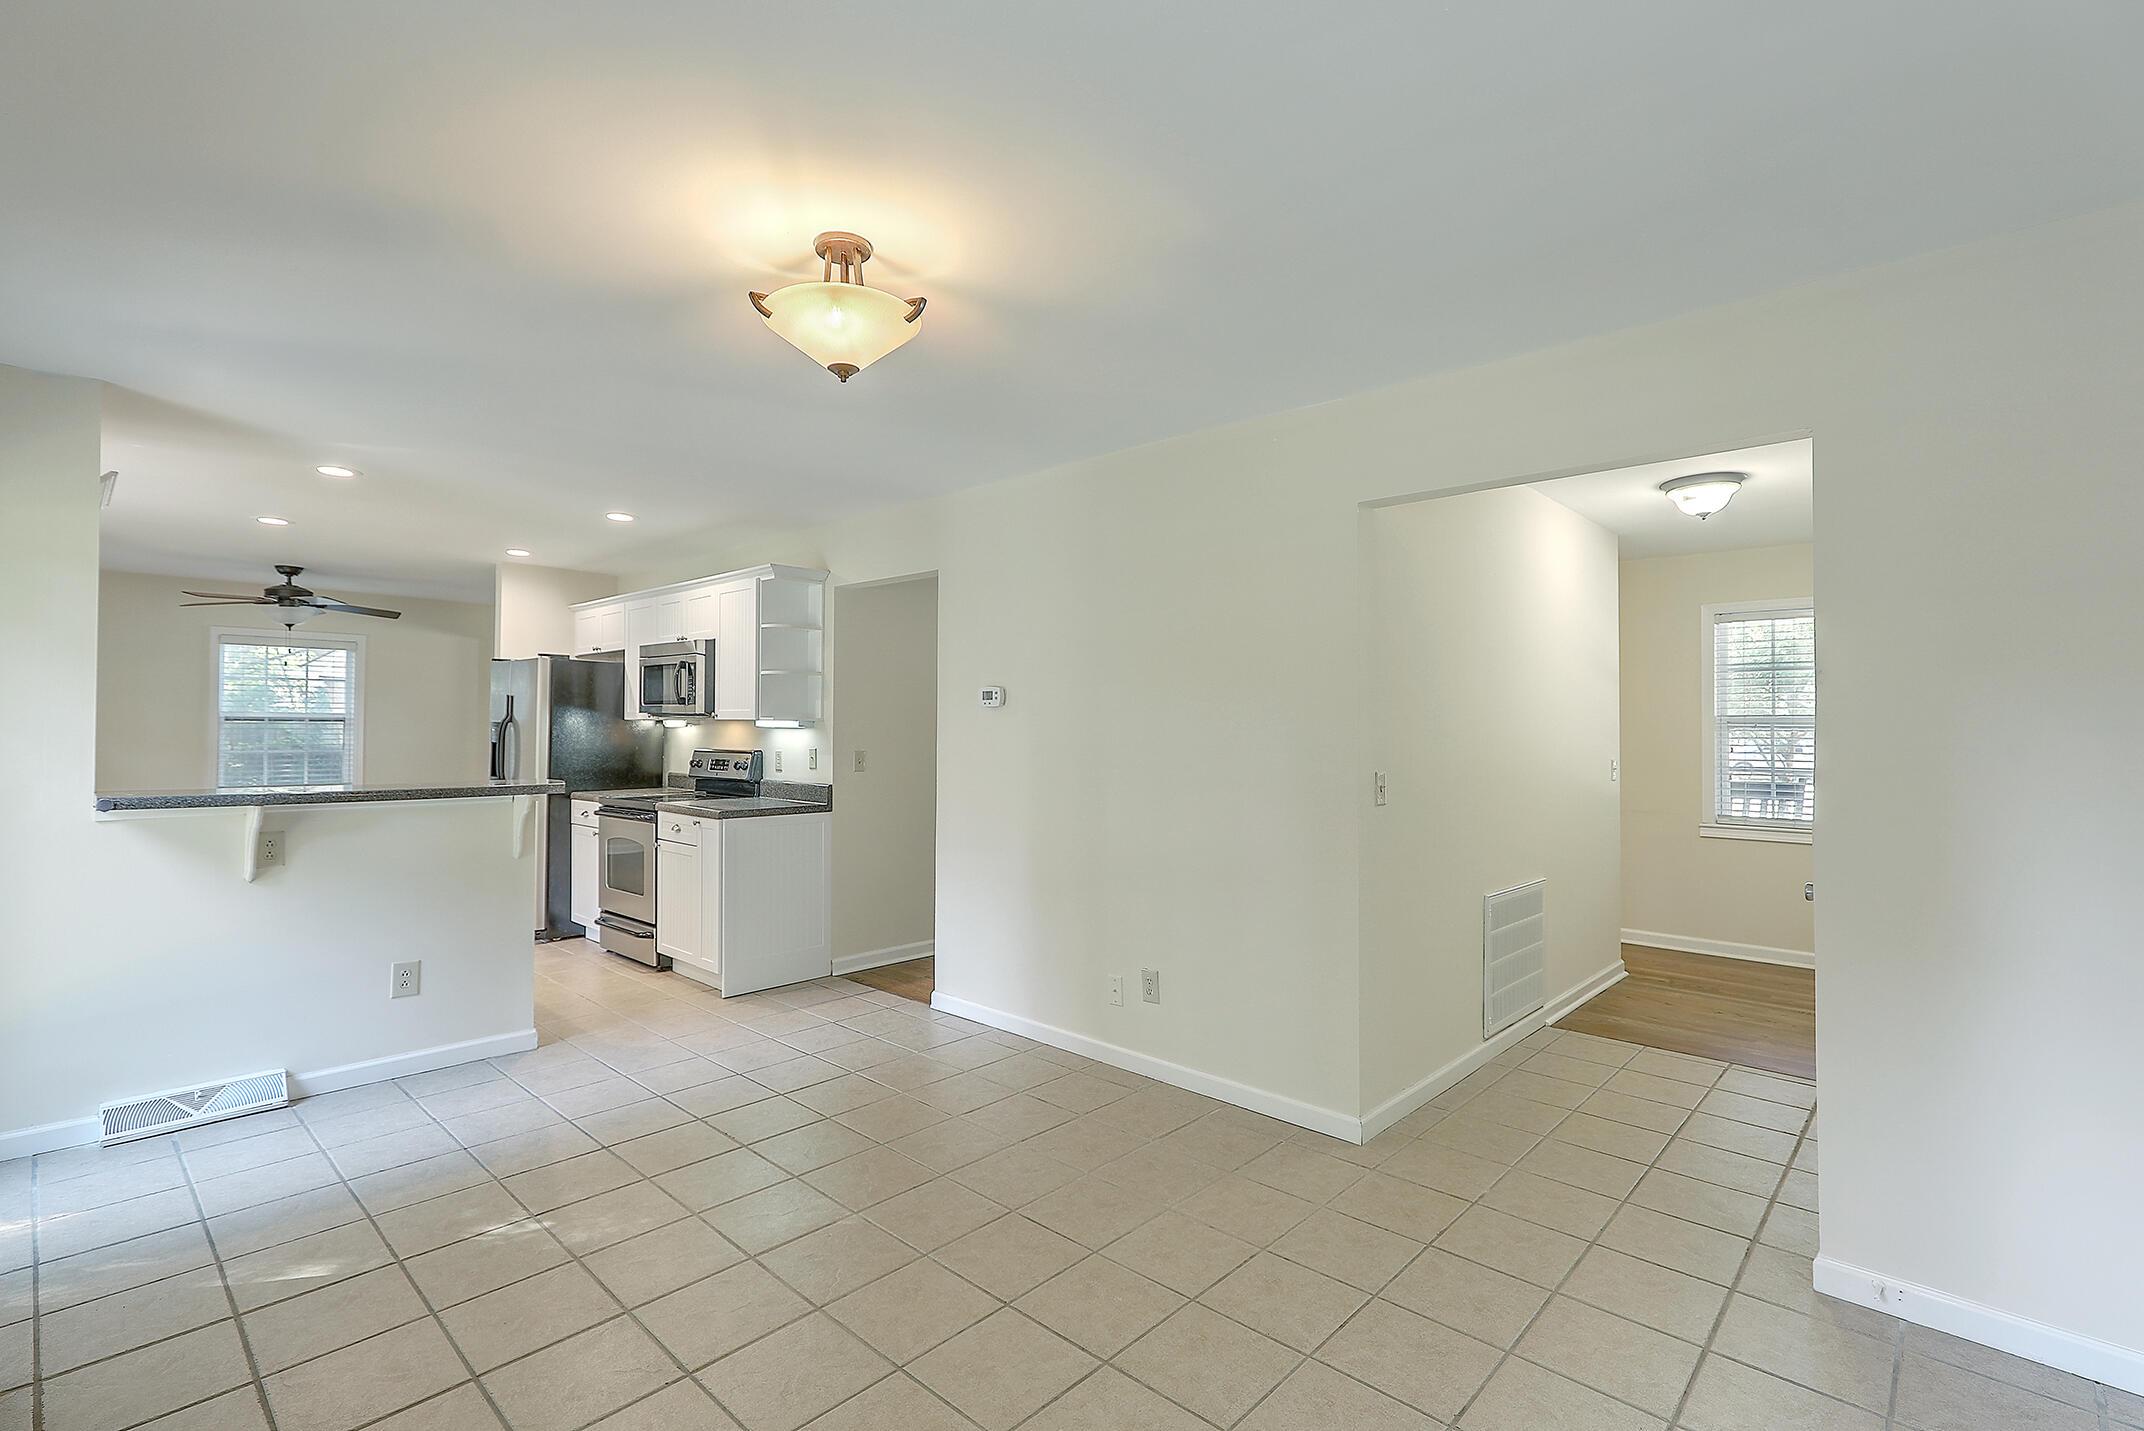 Cooper Estates Homes For Sale - 901 Searle, Mount Pleasant, SC - 18